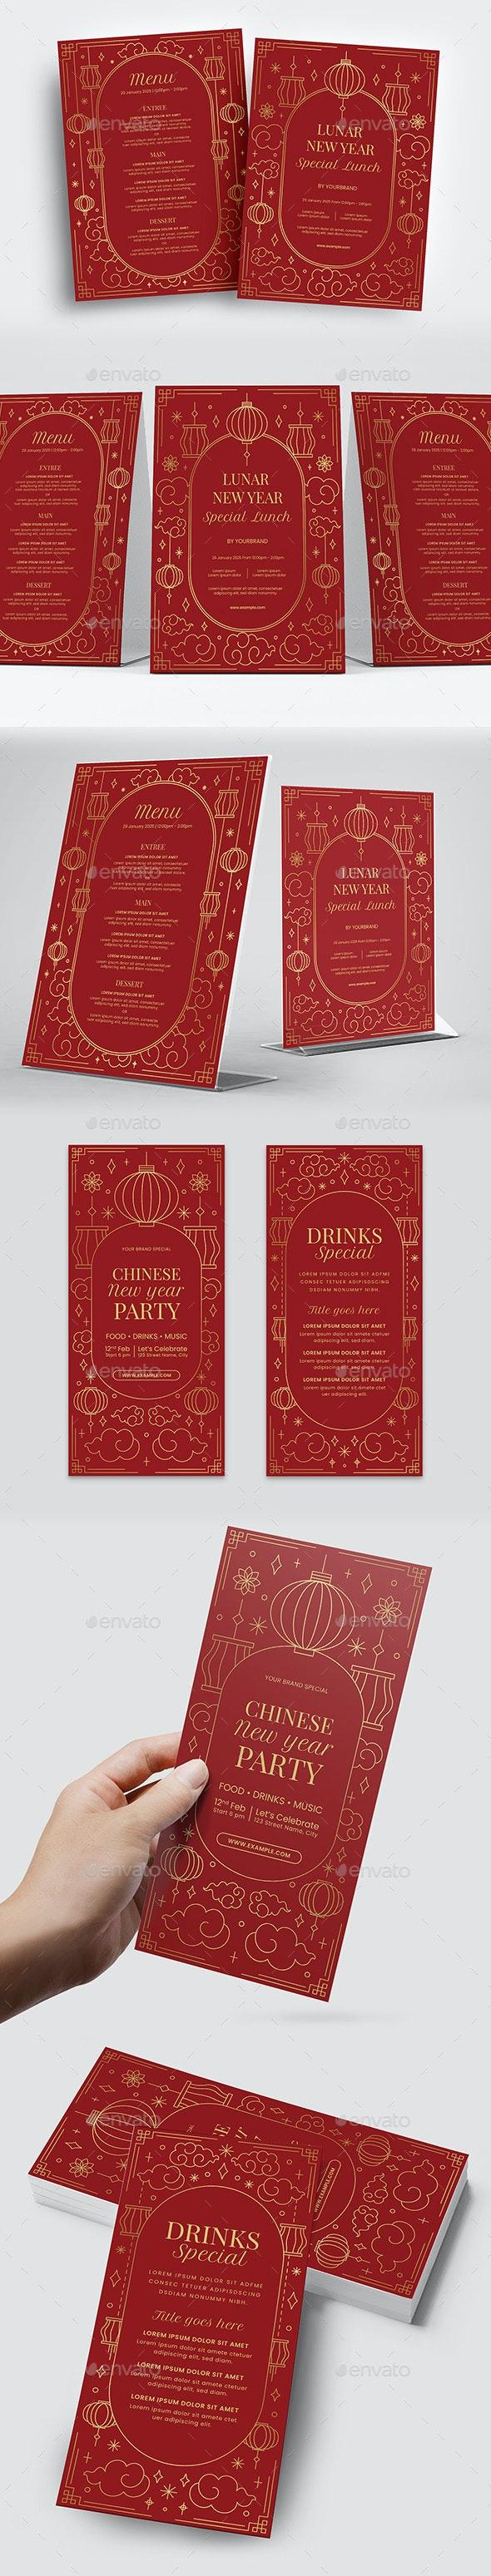 Chinese New Year Menu Template - Food Menus Print Templates